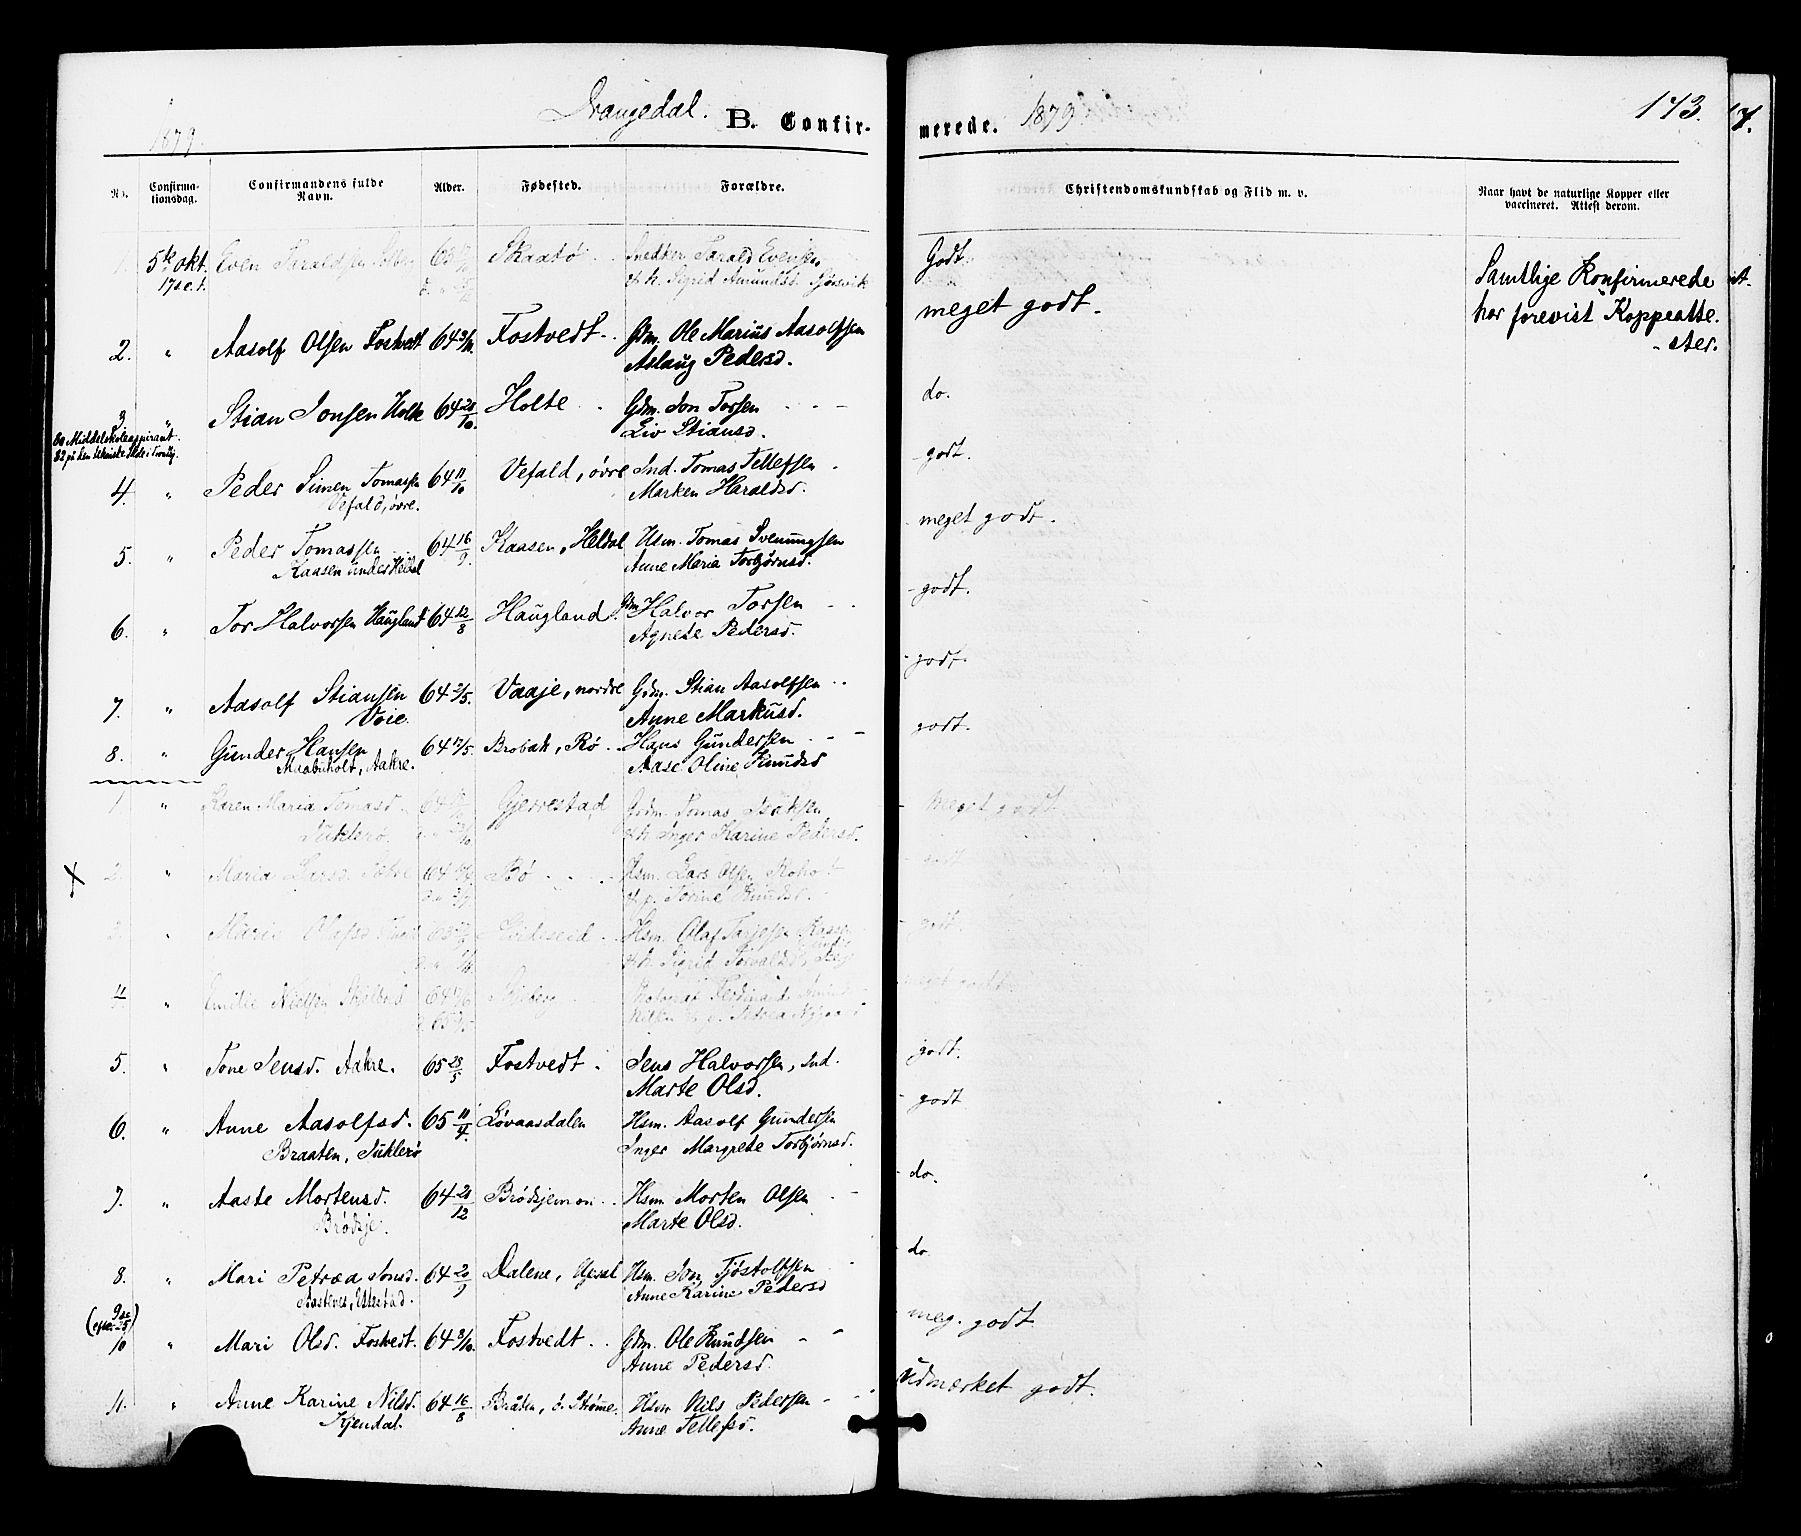 SAKO, Drangedal kirkebøker, F/Fa/L0009: Ministerialbok nr. 9 /1, 1872-1884, s. 173